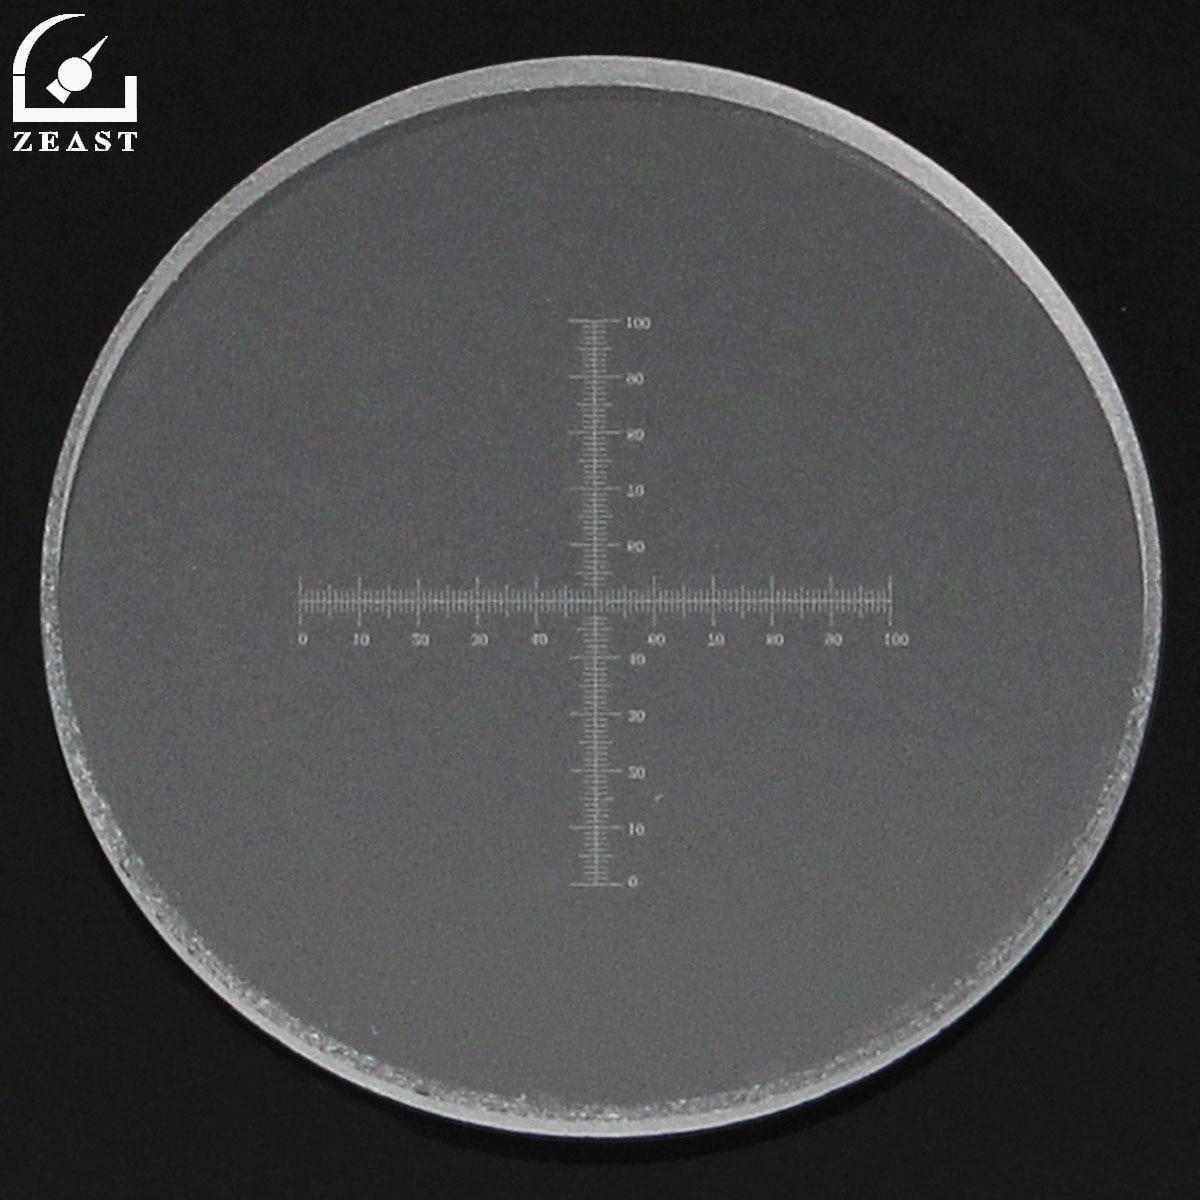 Шкала микроскопа 10 мм/100 0,1 мм C7 объектив микрометр калибровки слайд